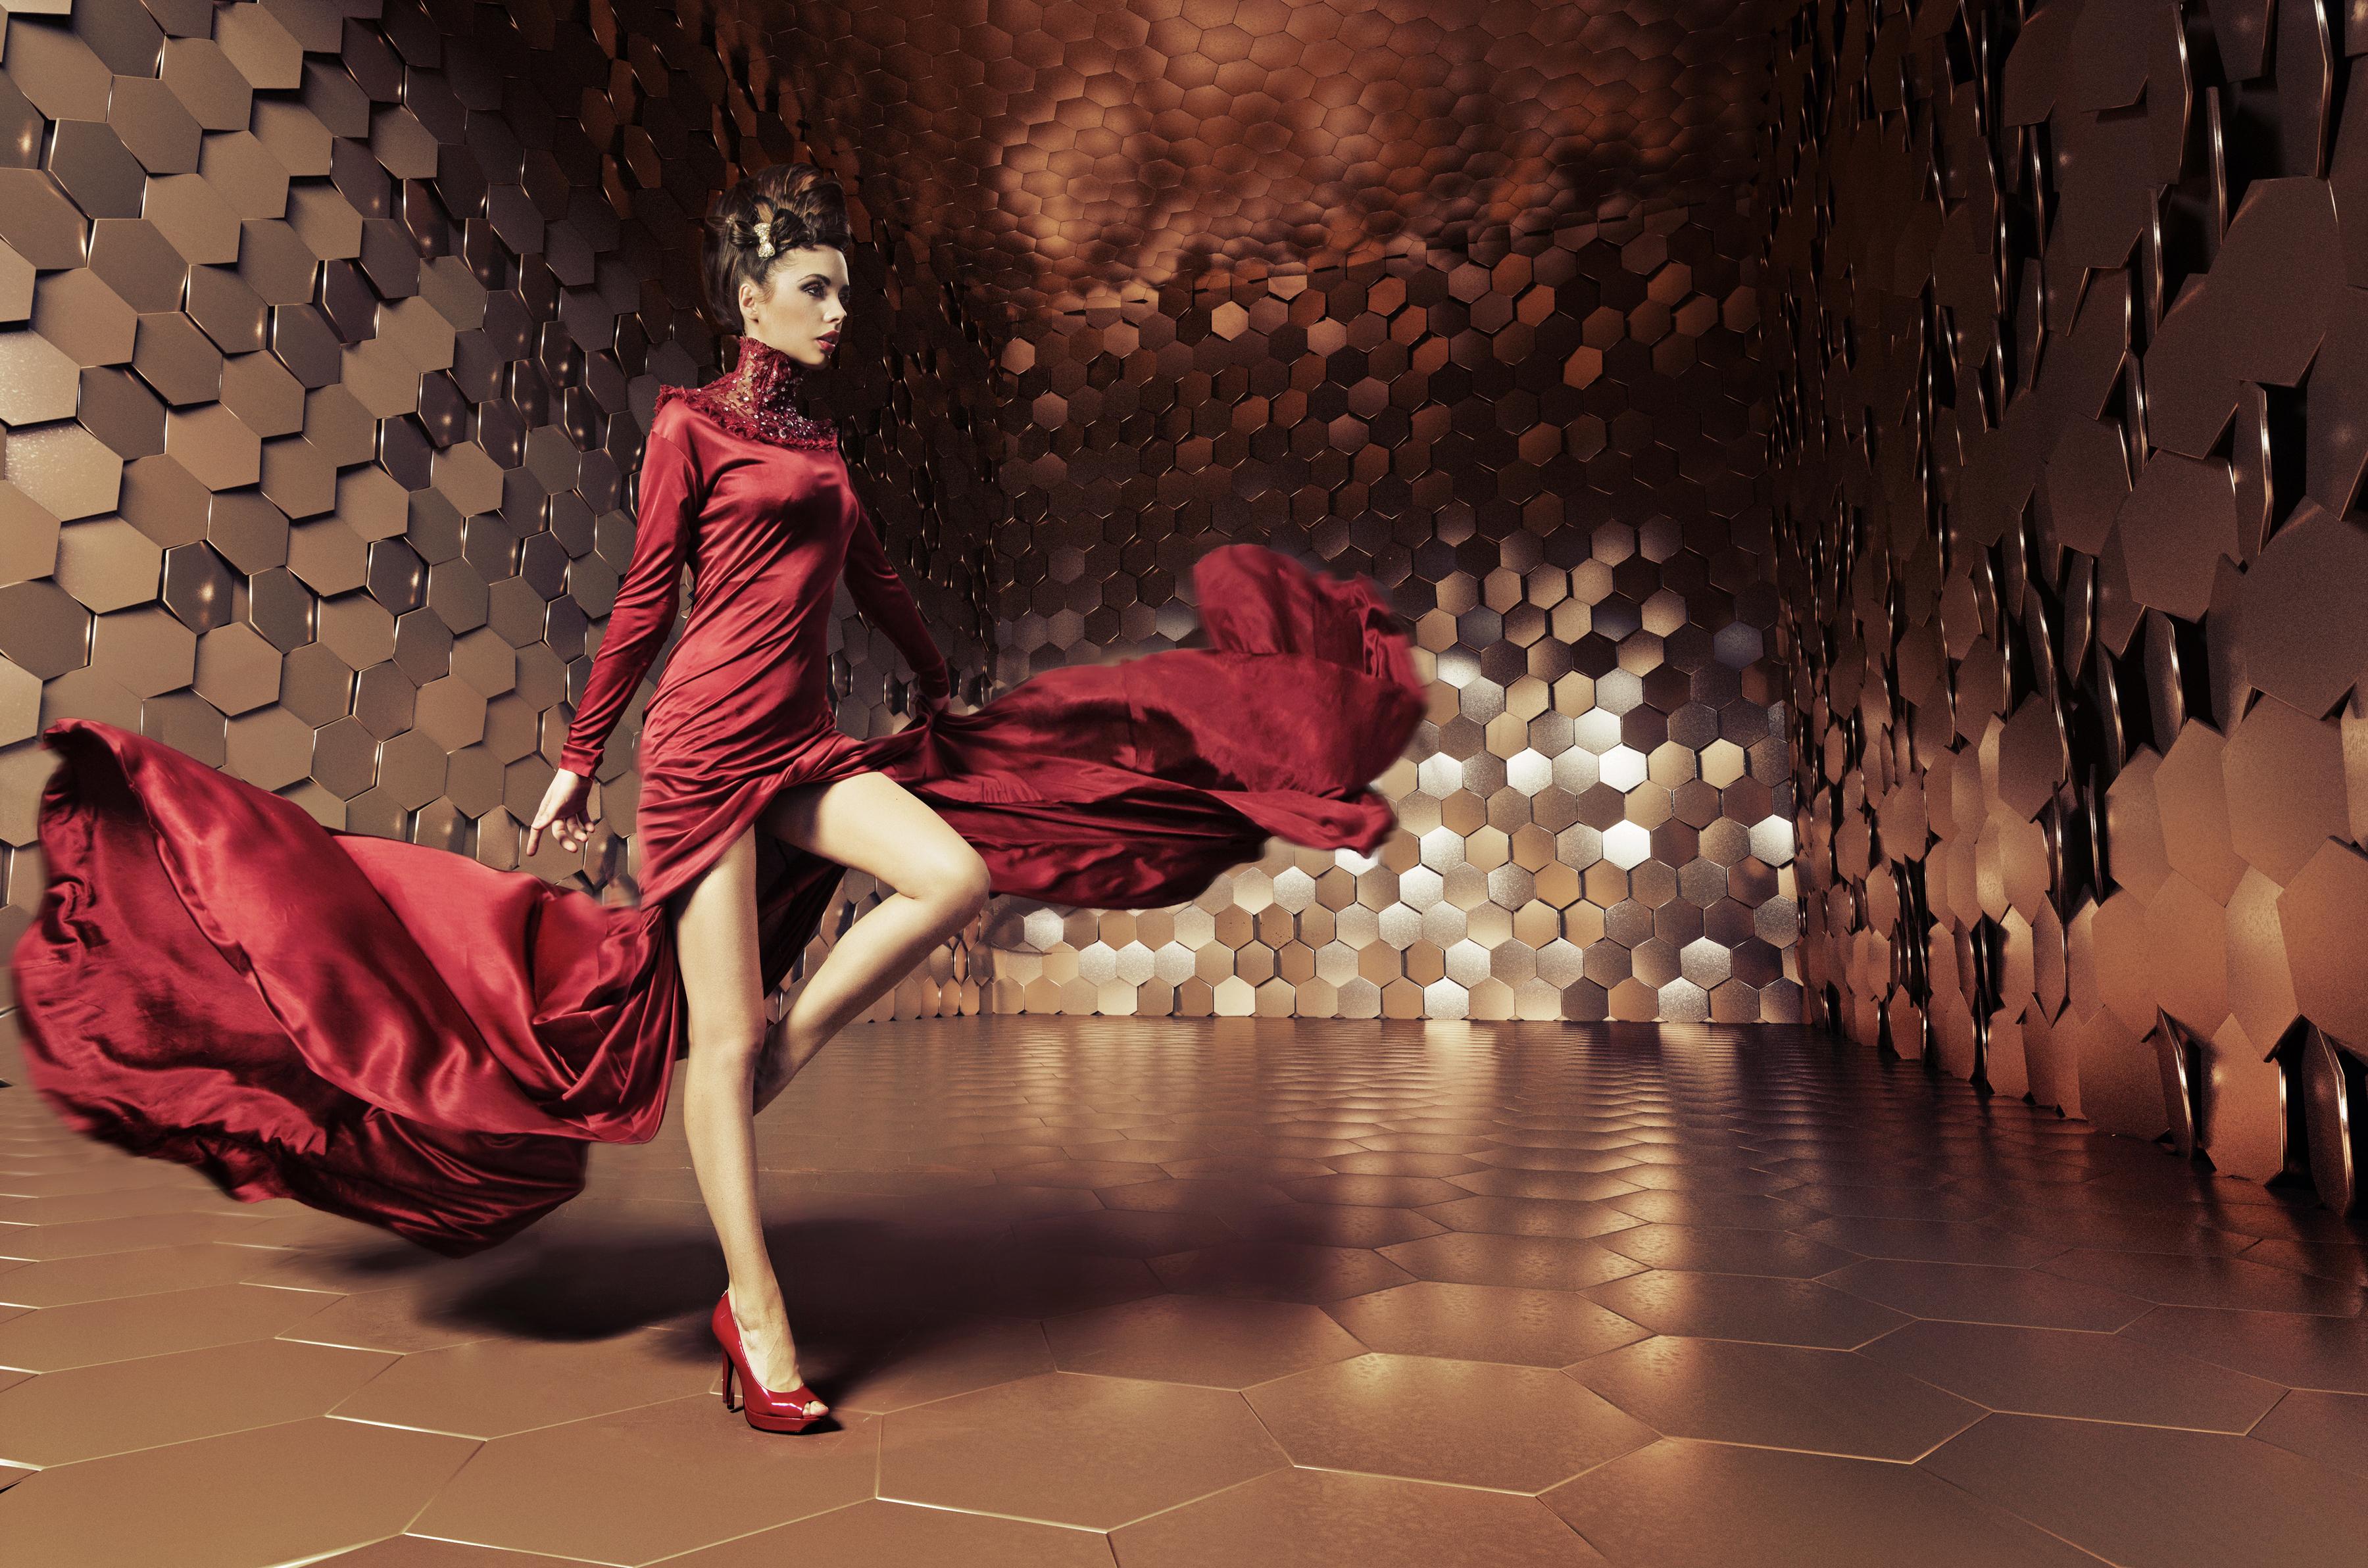 фото фантазии на тему красной пленки подвесной подшипник зил